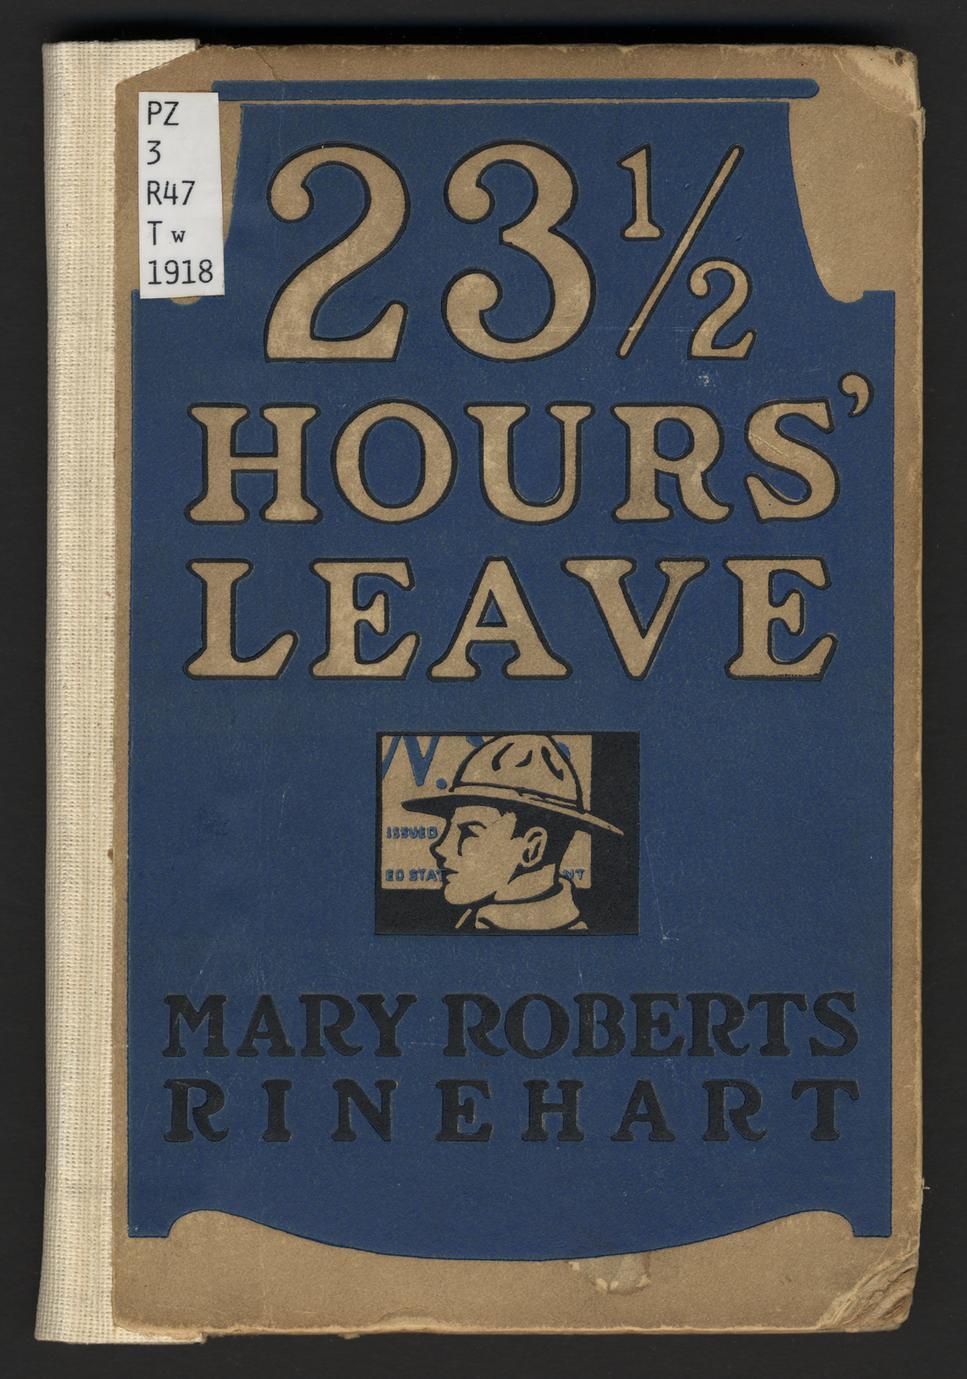 Twenty-three and a half hours' leave (1 of 3)